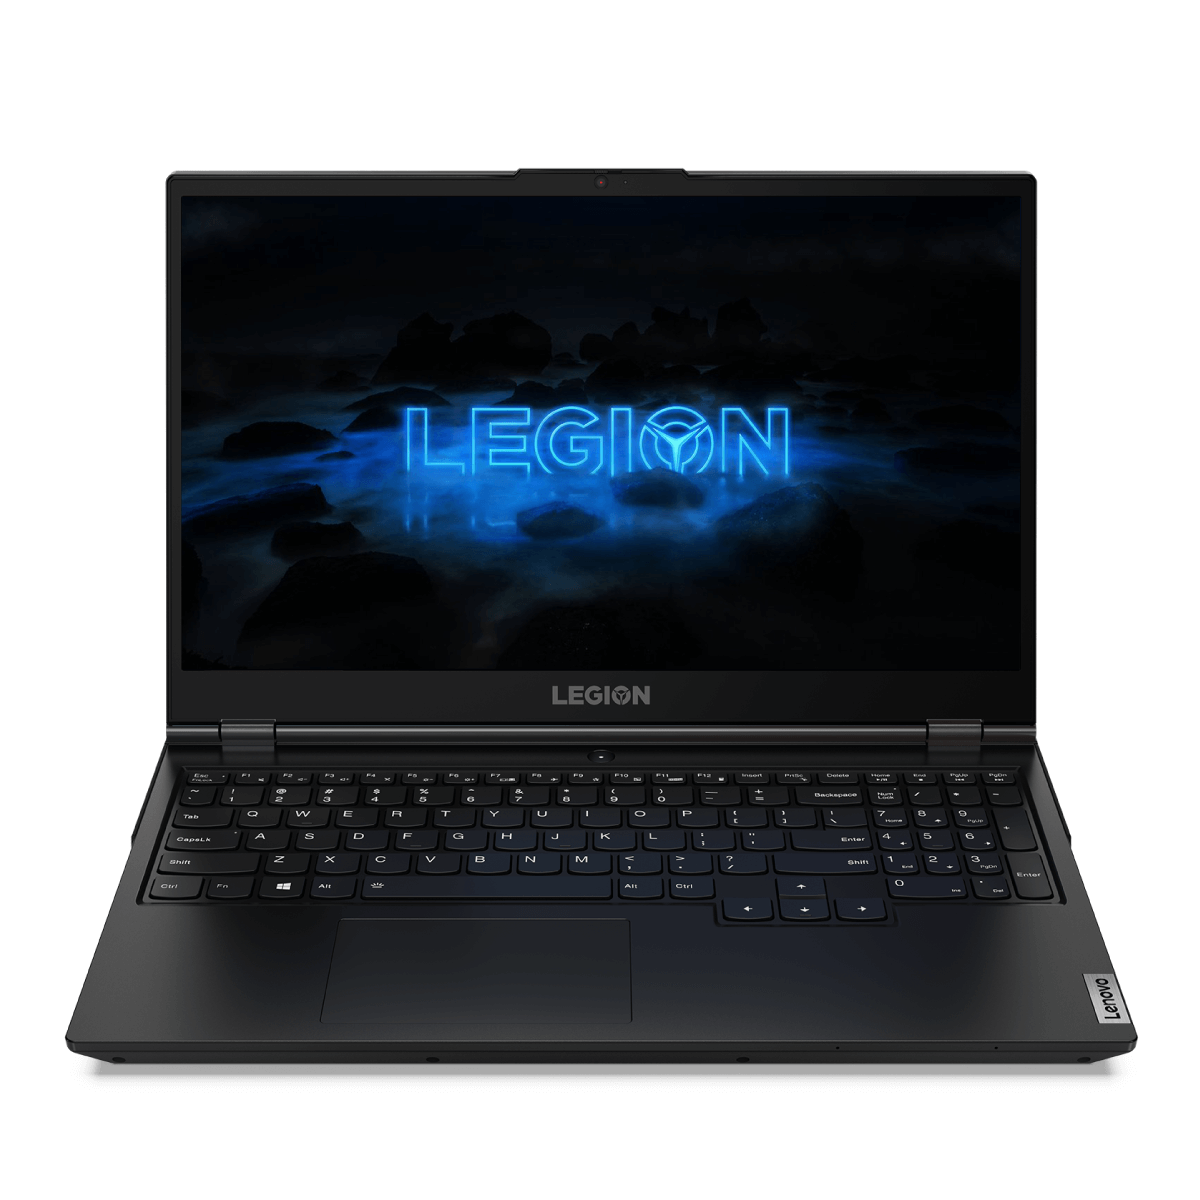 "Legion 5 (i7, 15.6"", Phantom Black)"